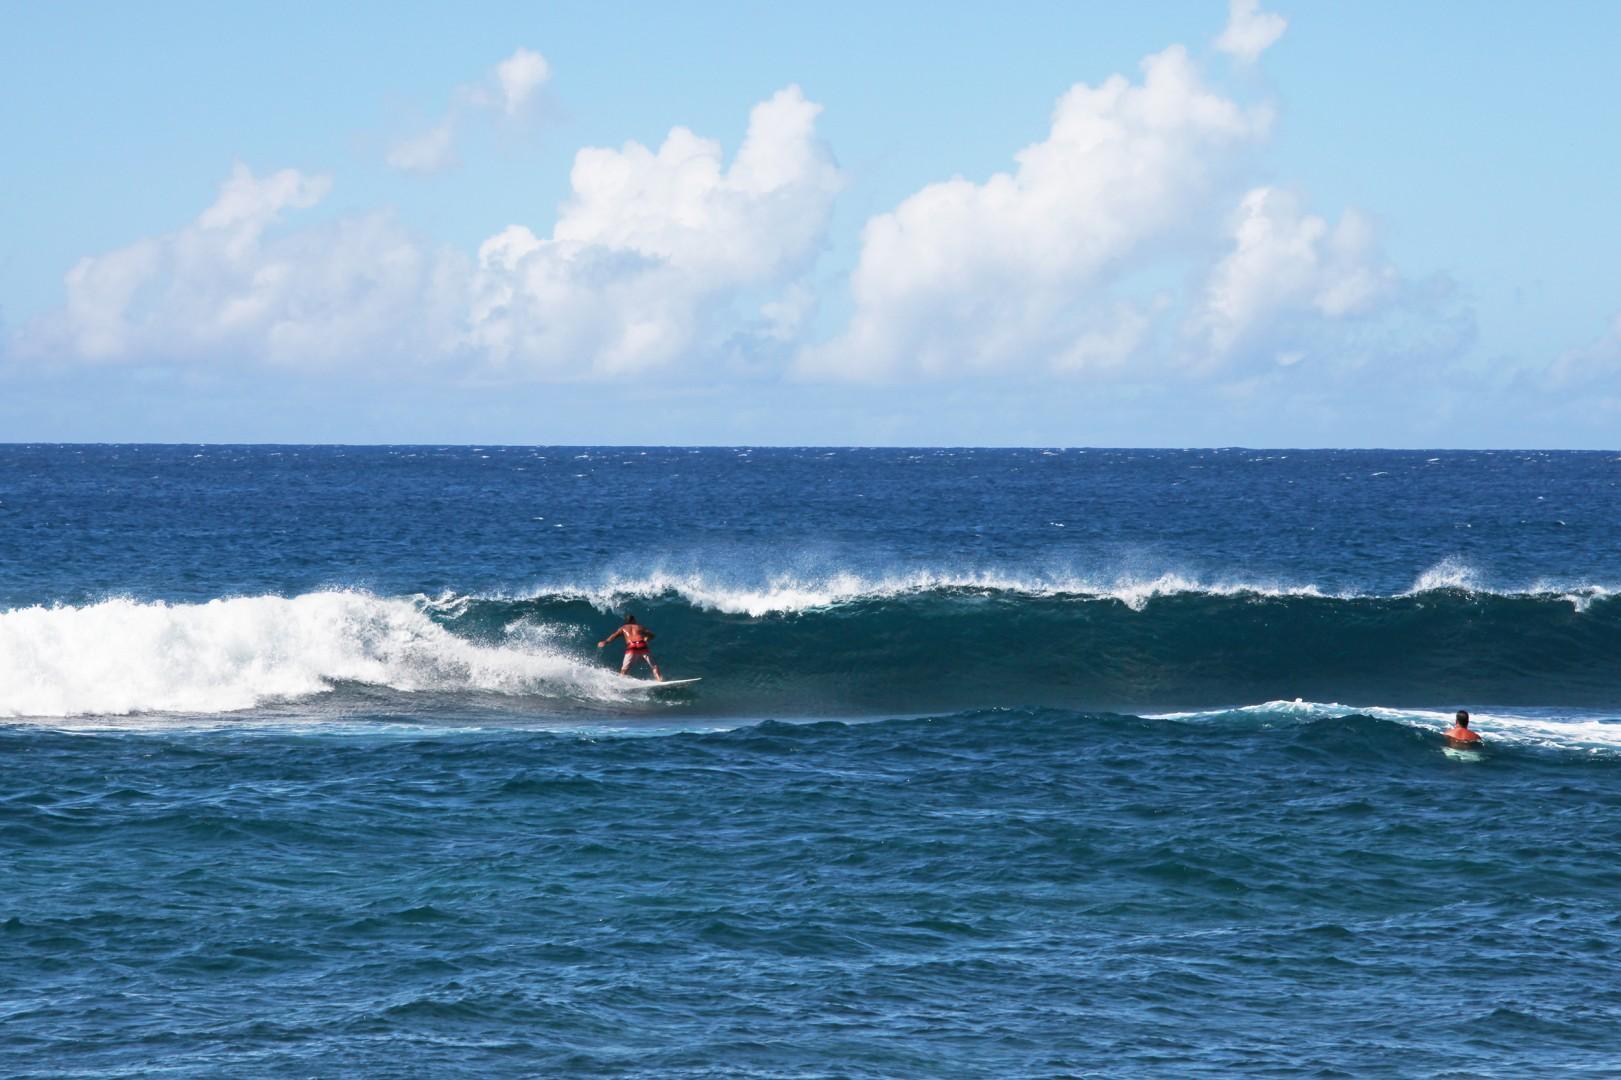 PKs surf break